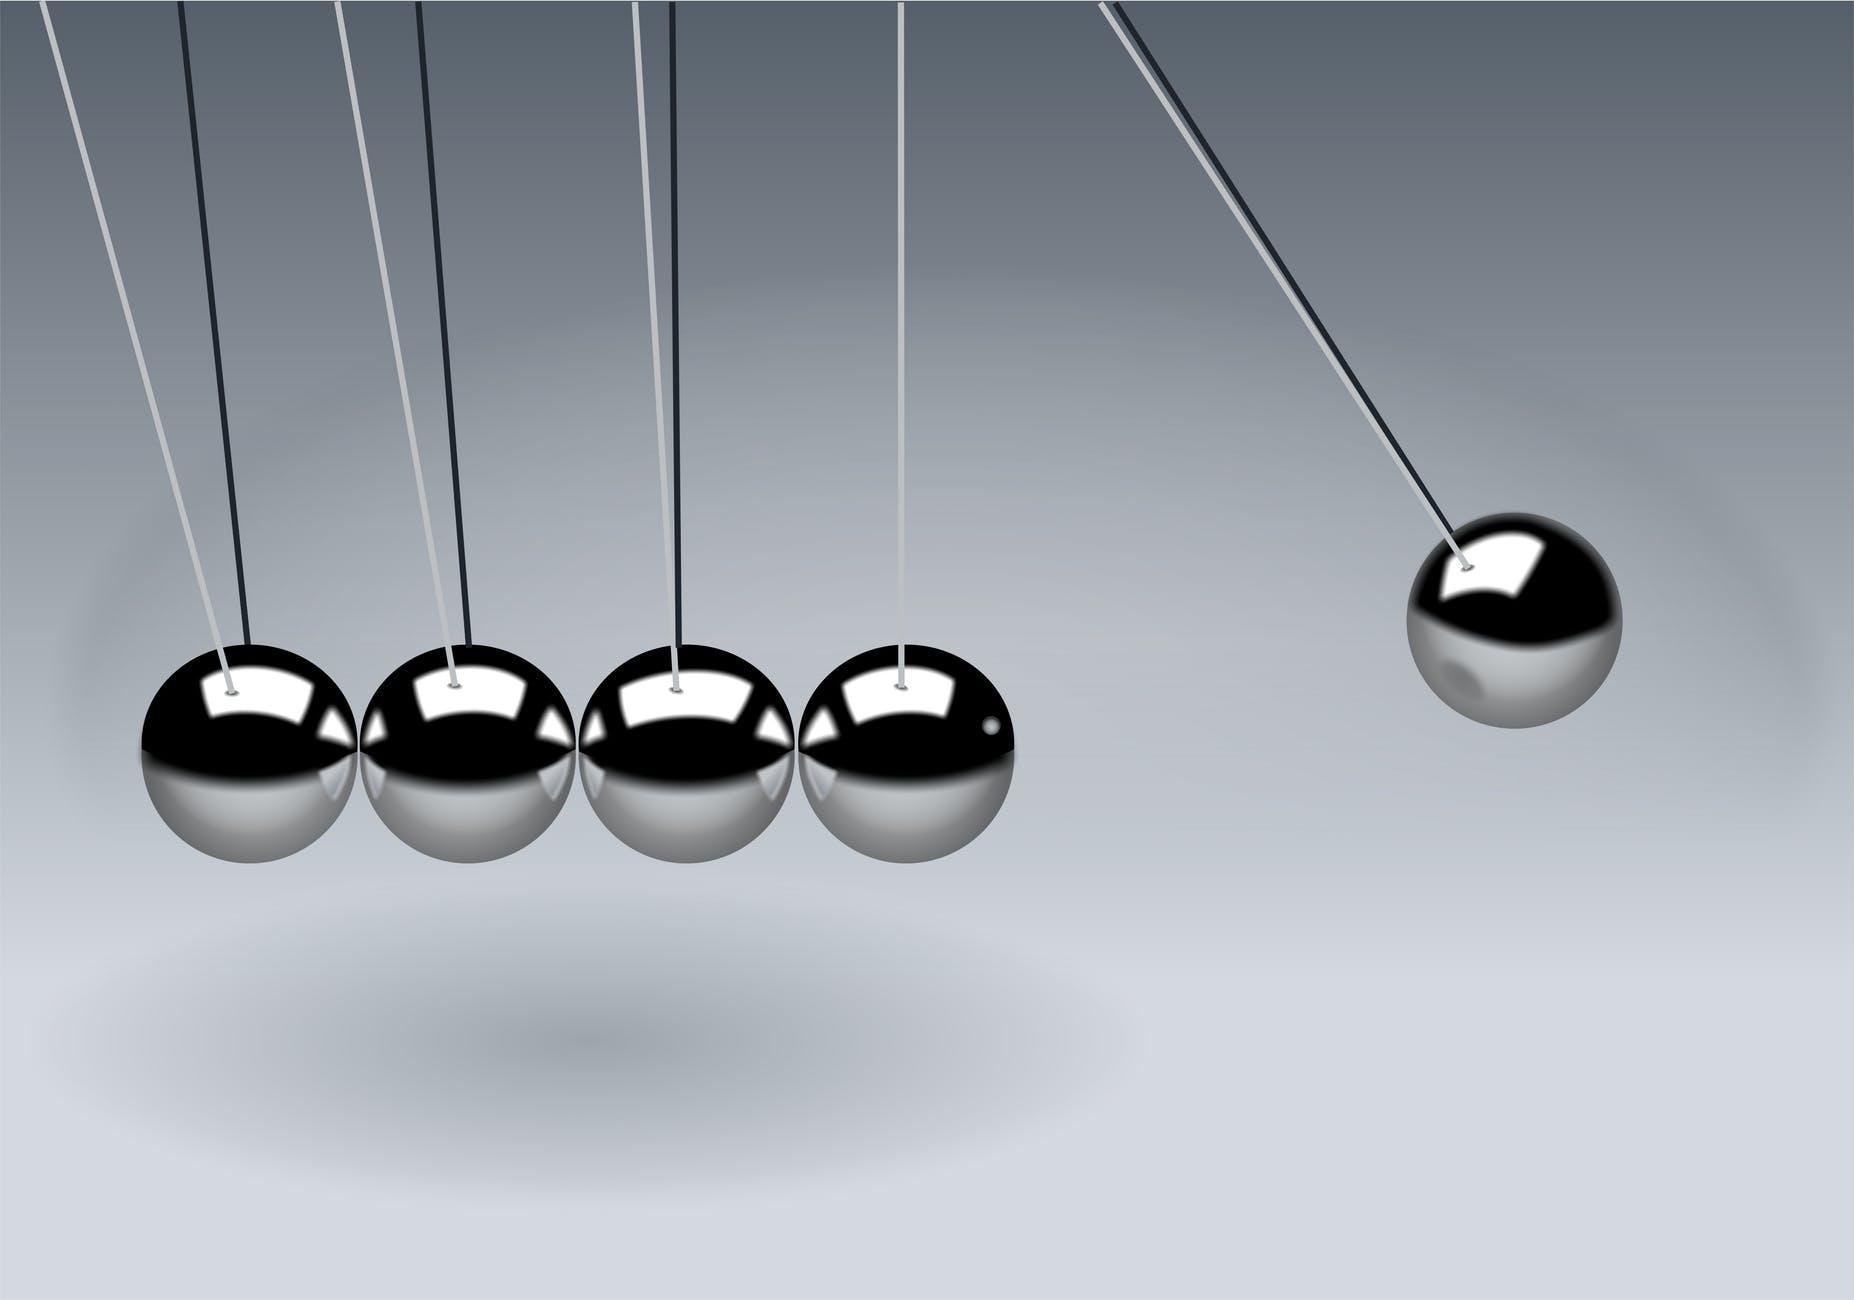 newton-s-cradle-balls-sphere-action-60582.jpeg